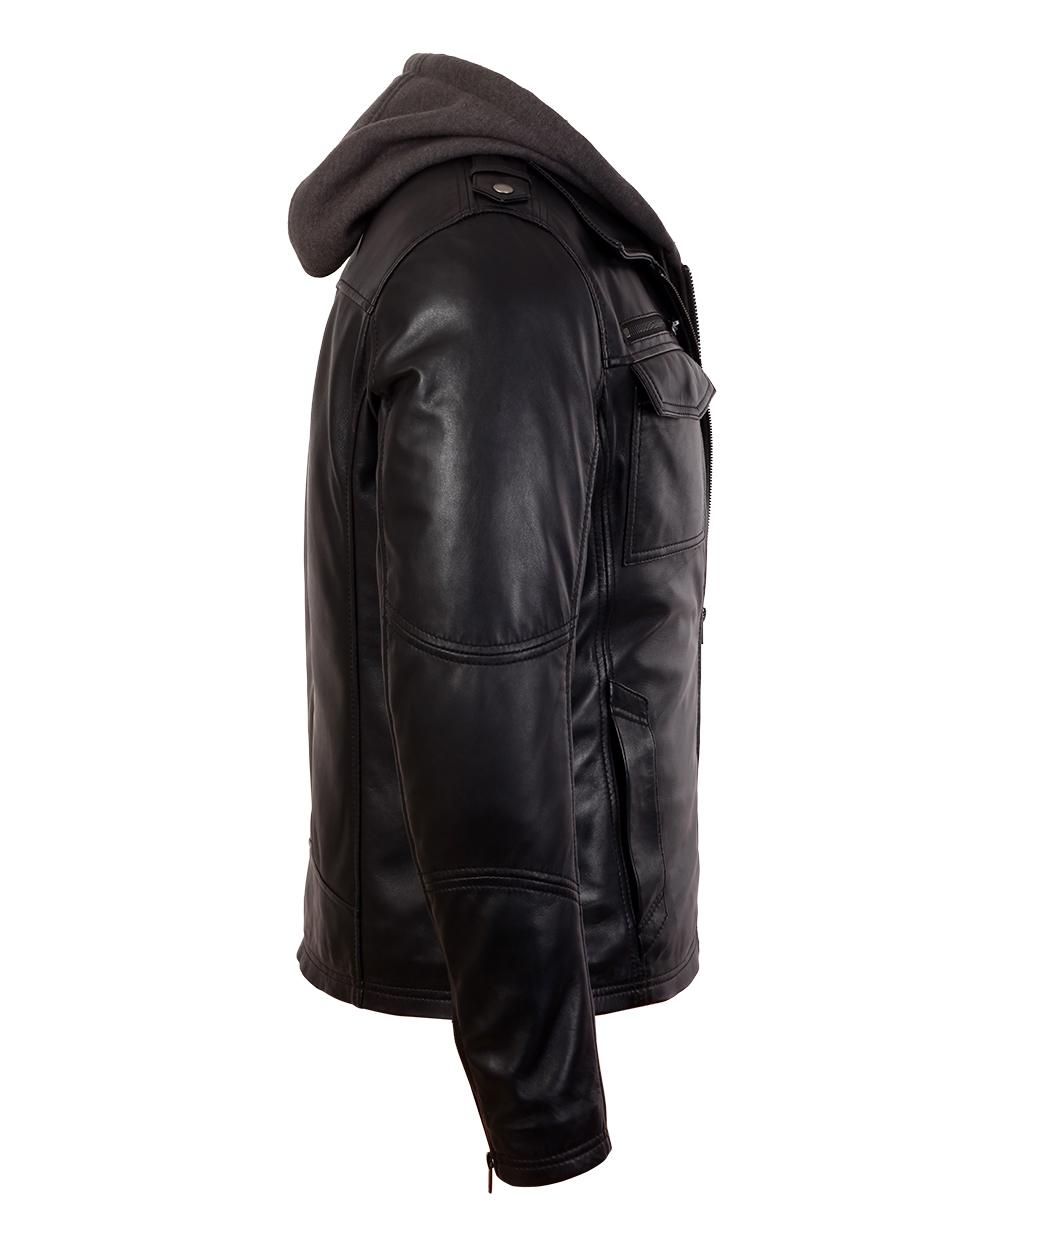 8b822b51b87e Mens Black Bomber Lambskin Real Leather Jacket with Hood - Genuine Leather  Jackets by Corbani